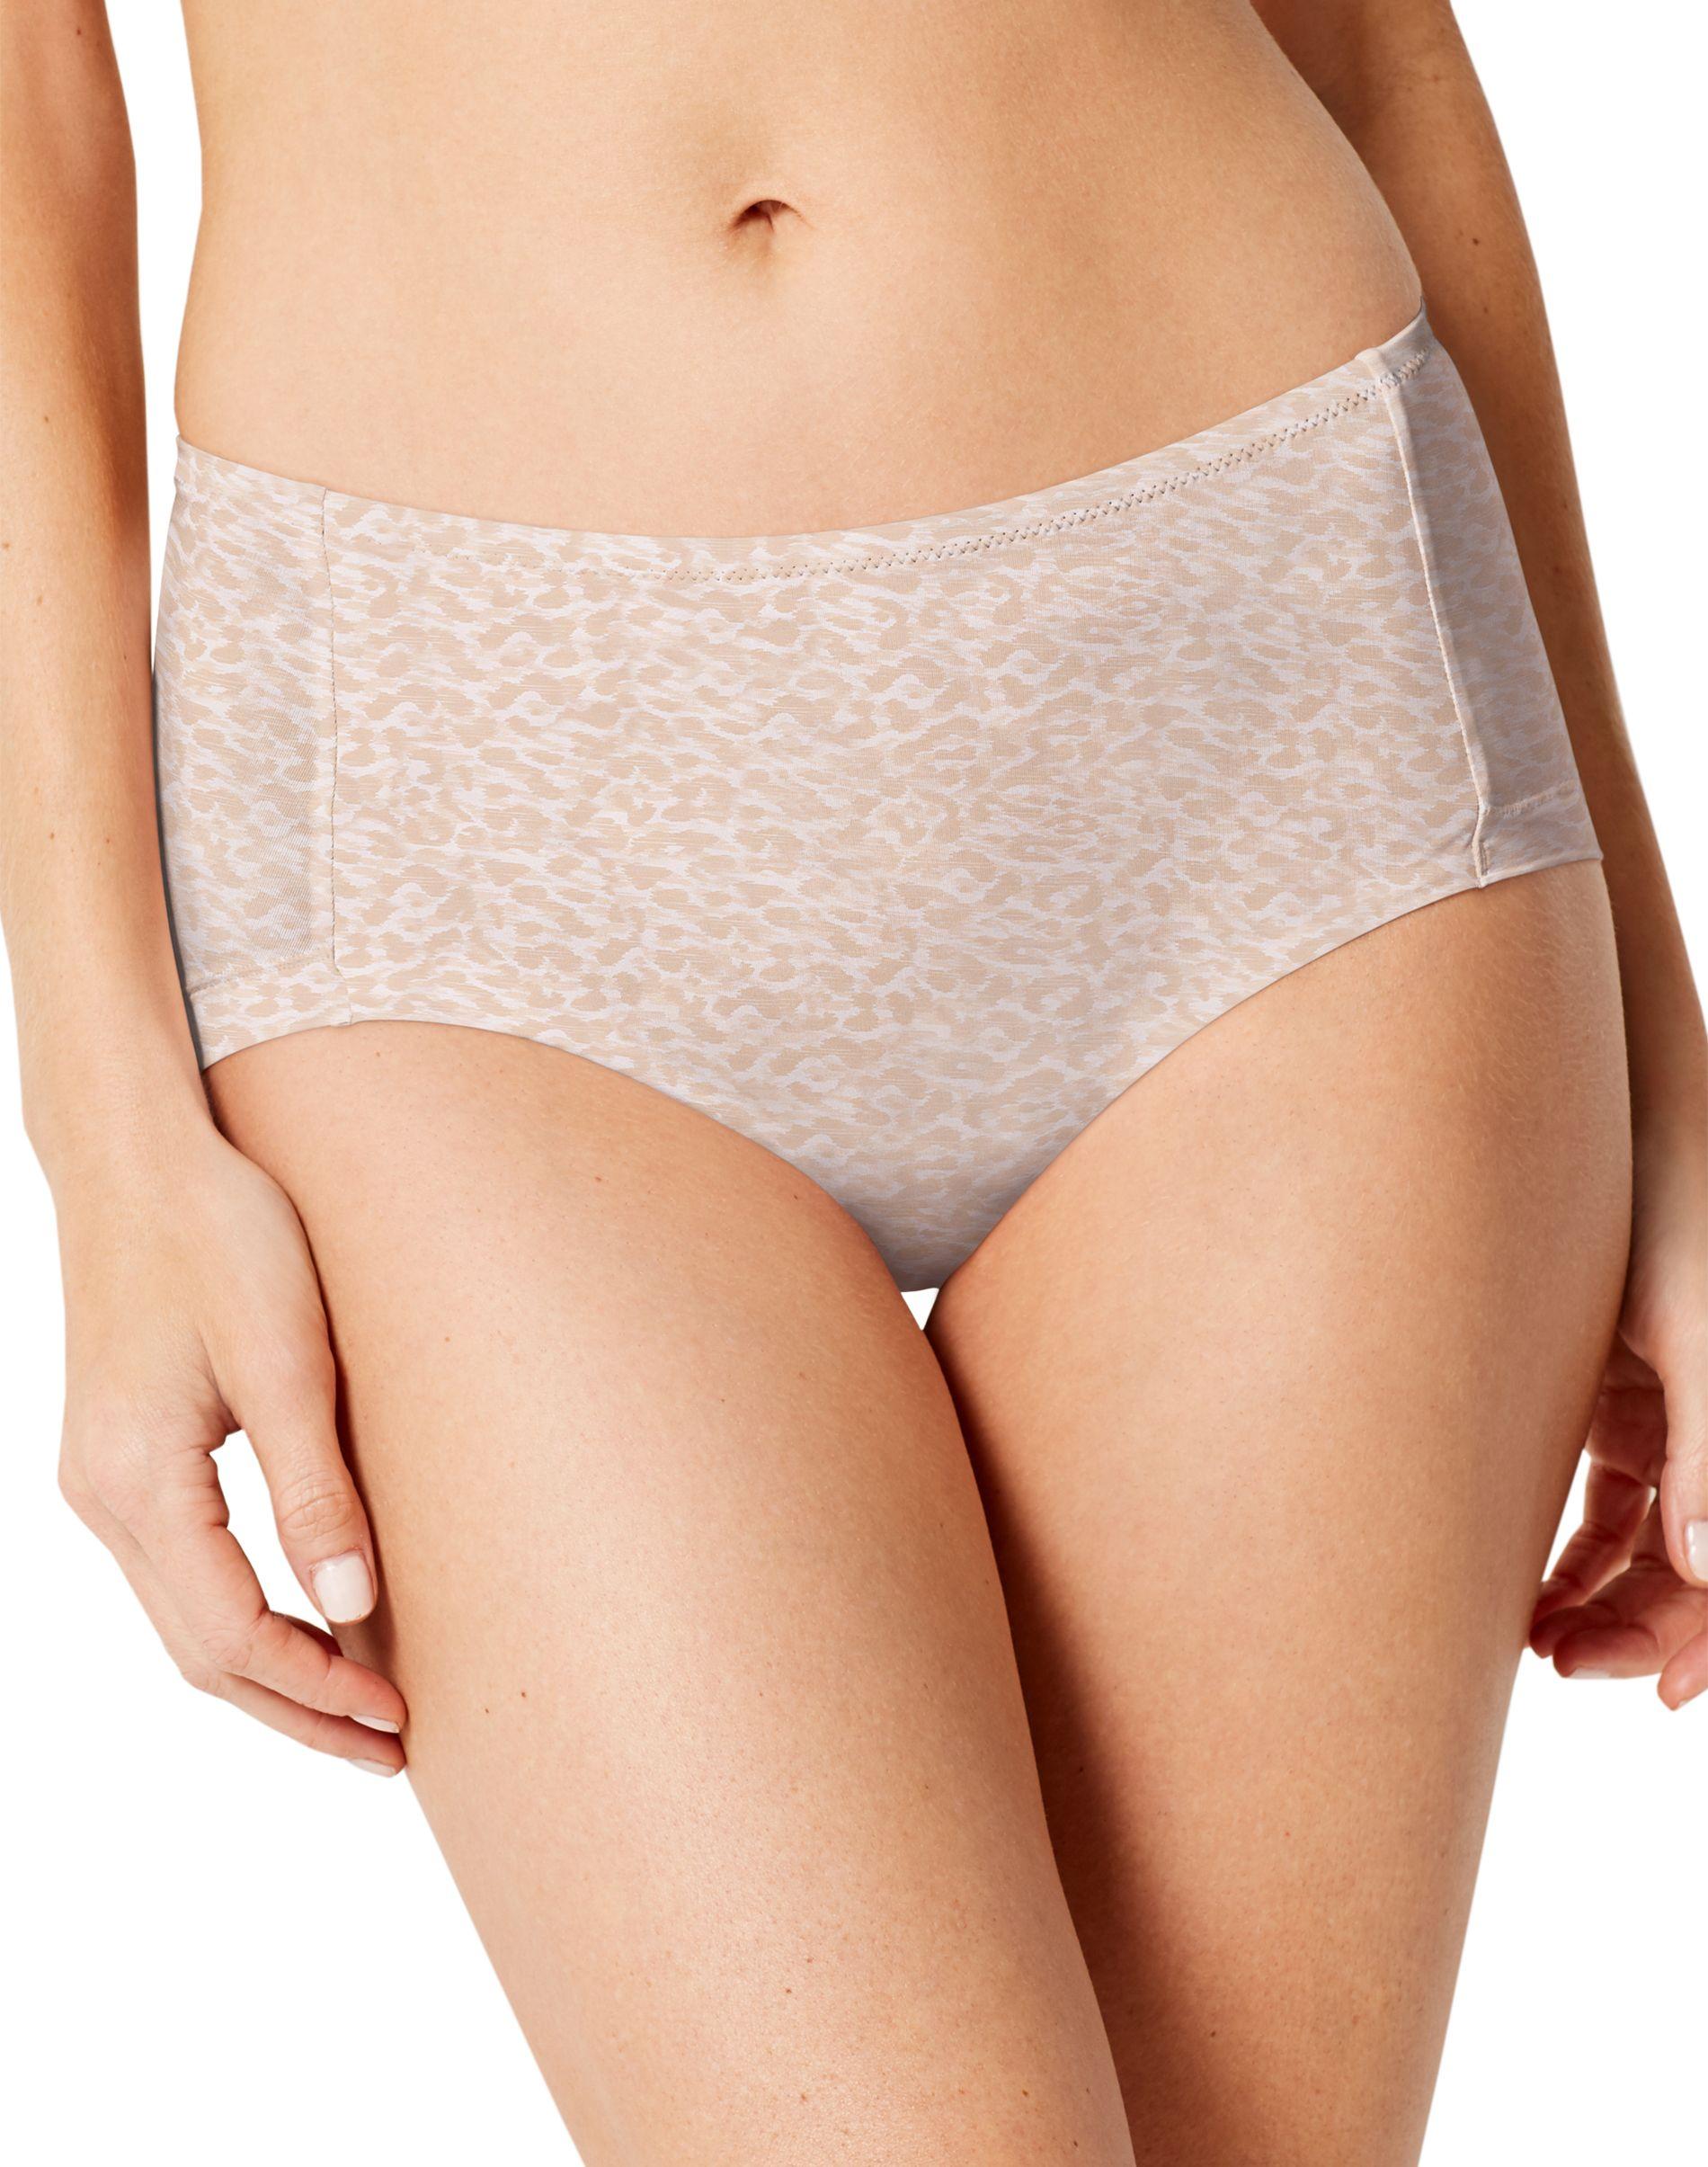 bali one smooth u uplift hipkini panty women Bali